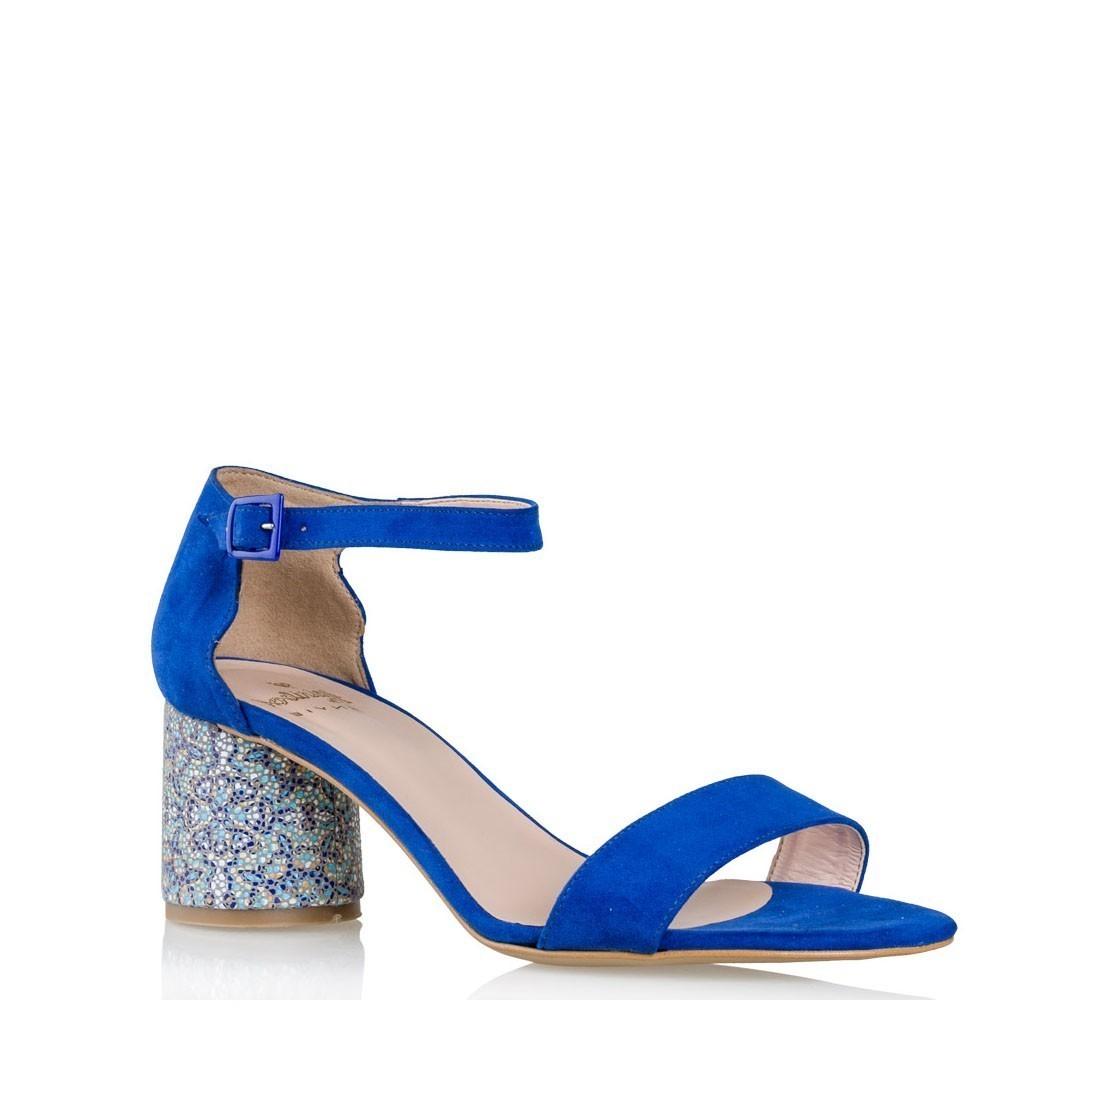 d5dccf003dbf Mairiboo by Envie Shoes Γυναικεία Πέδιλα M03-07554-38 Μπλε GAUDI |Γυναικεία  & Ανδρικά Παπούτσια - BagiotaShoes.gr